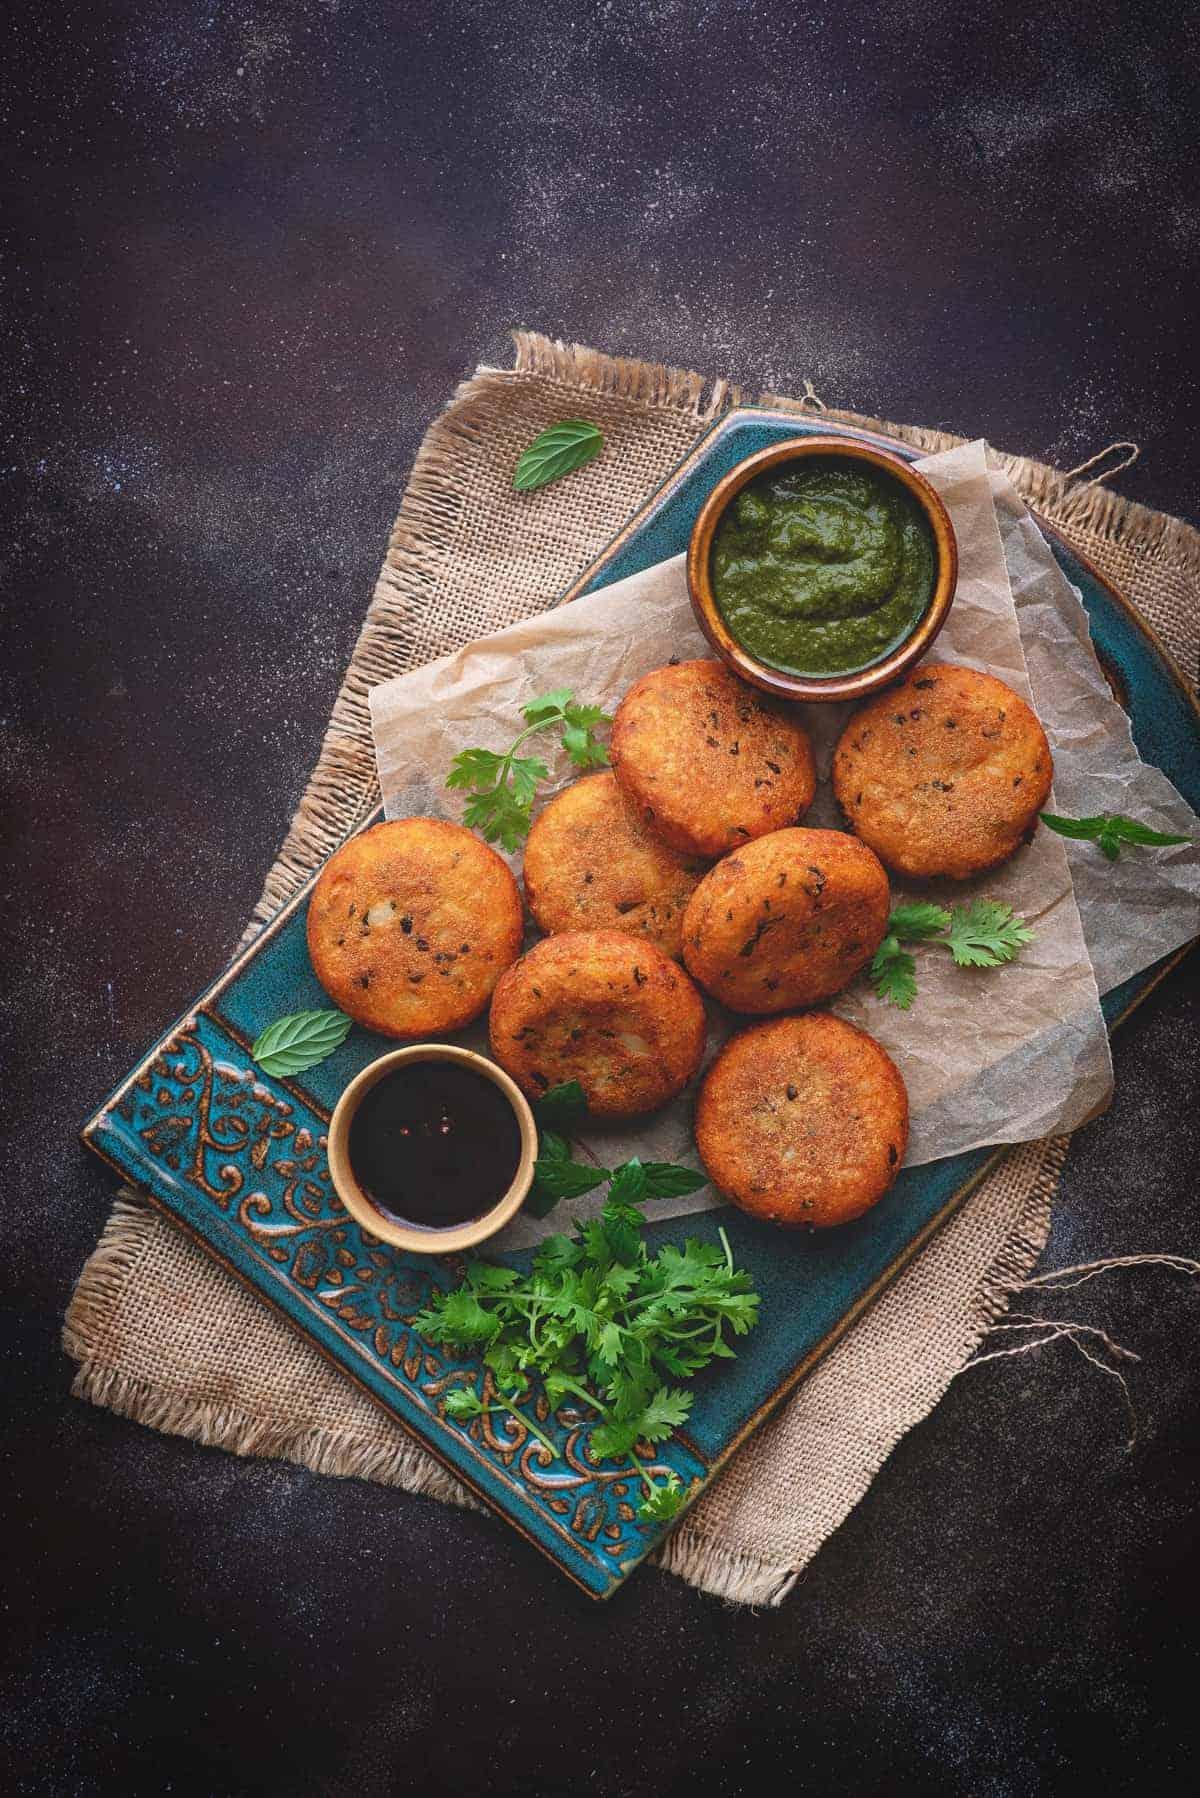 Crispy aloo patties served on  blue ceramic tray, chutney in bowls on side.